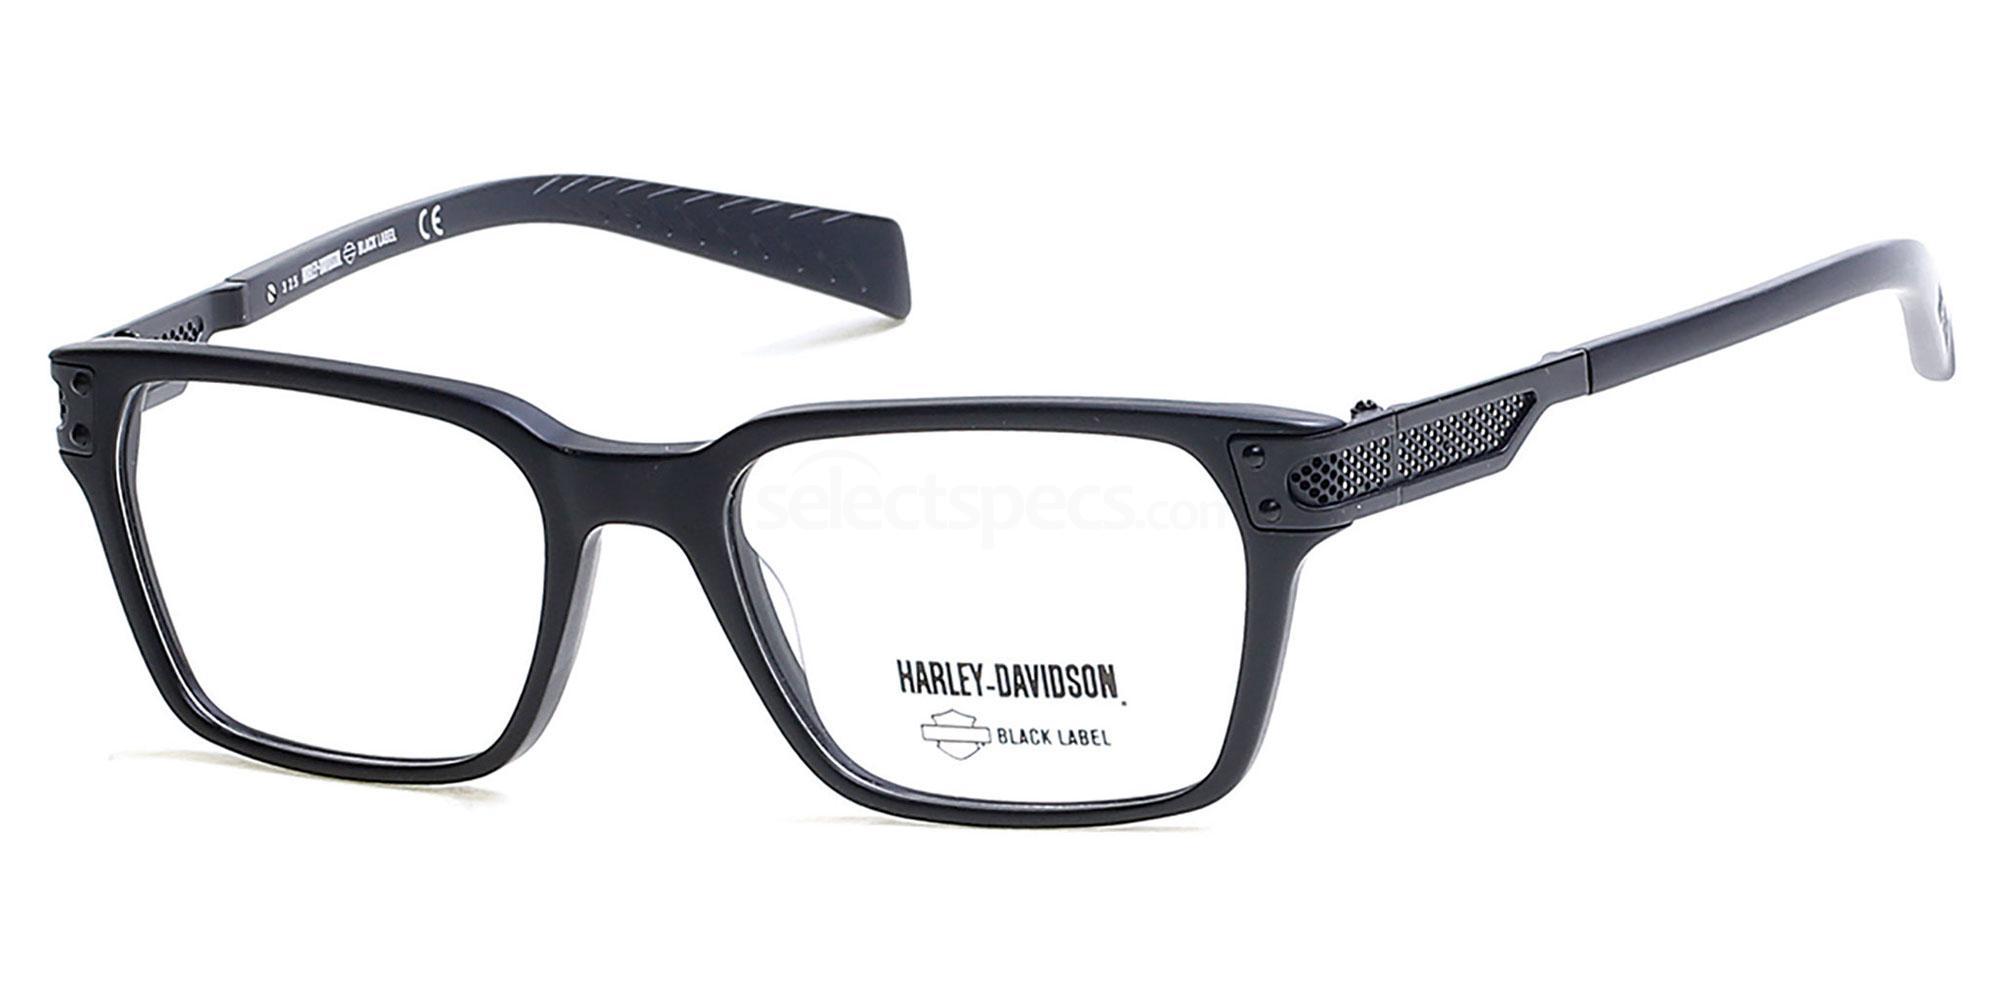 002 HD 1029 Glasses, Harley Davidson